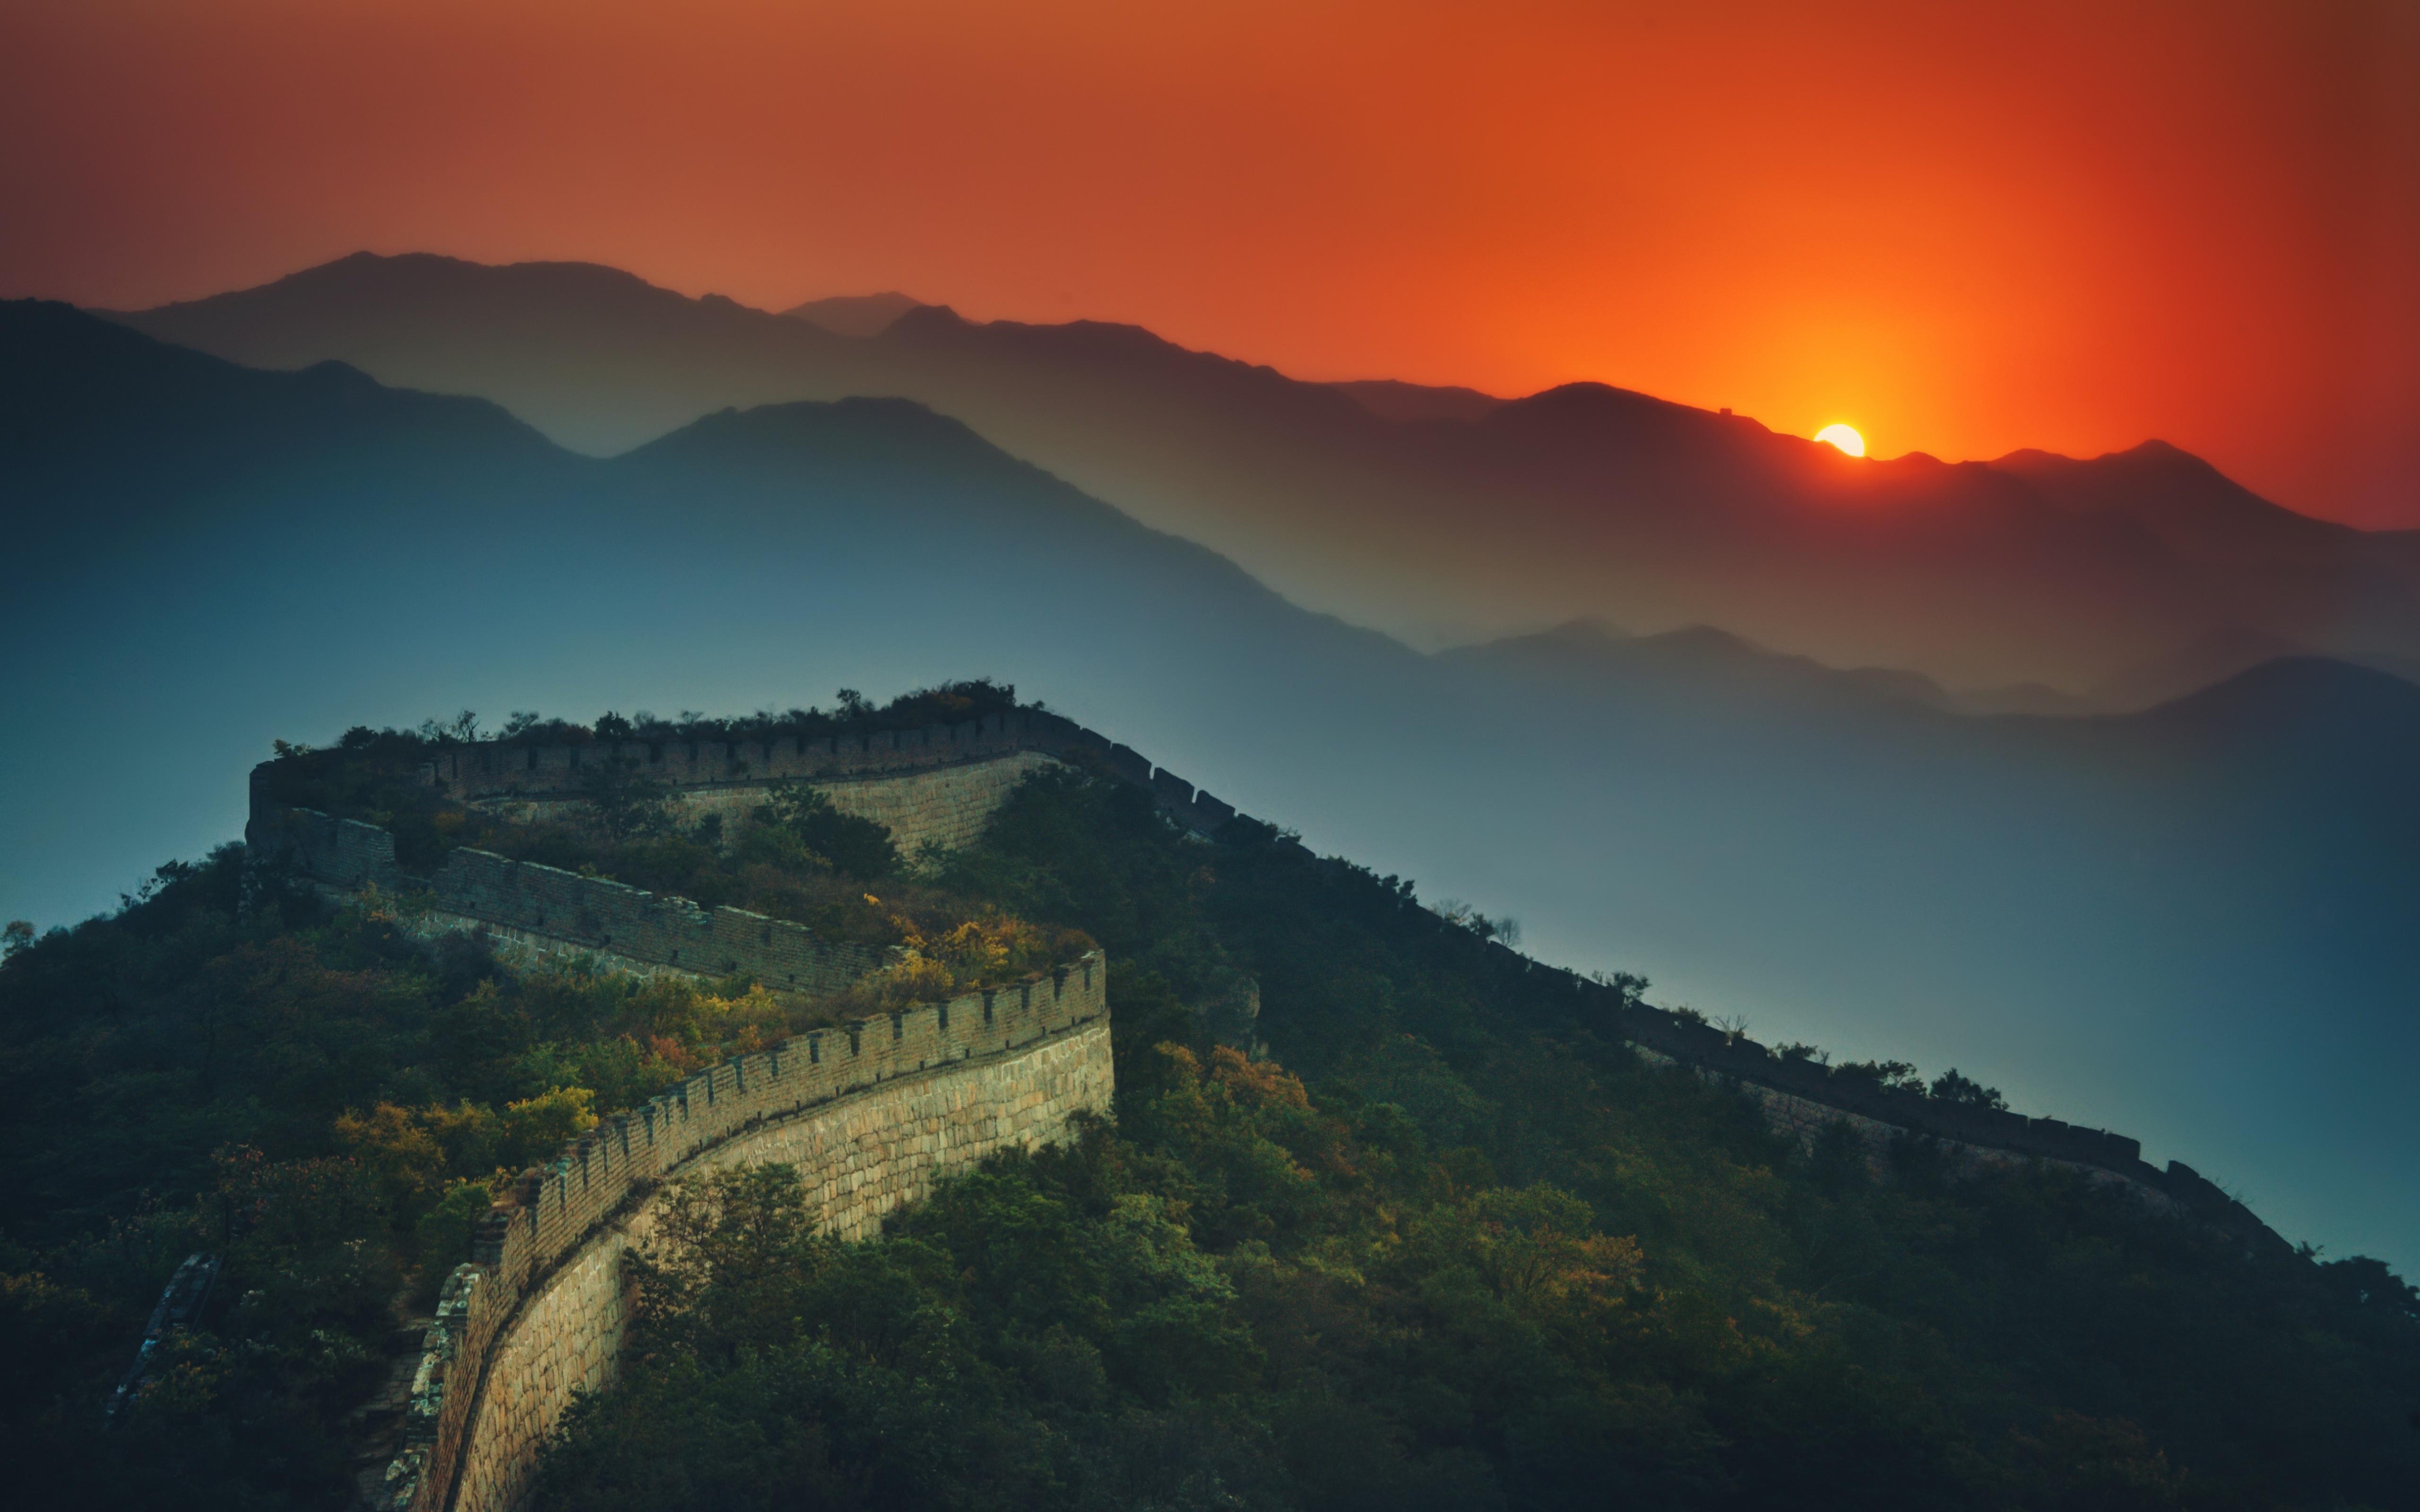 The Great Wall Of China 5k Retina Ultra HD Wallpaper